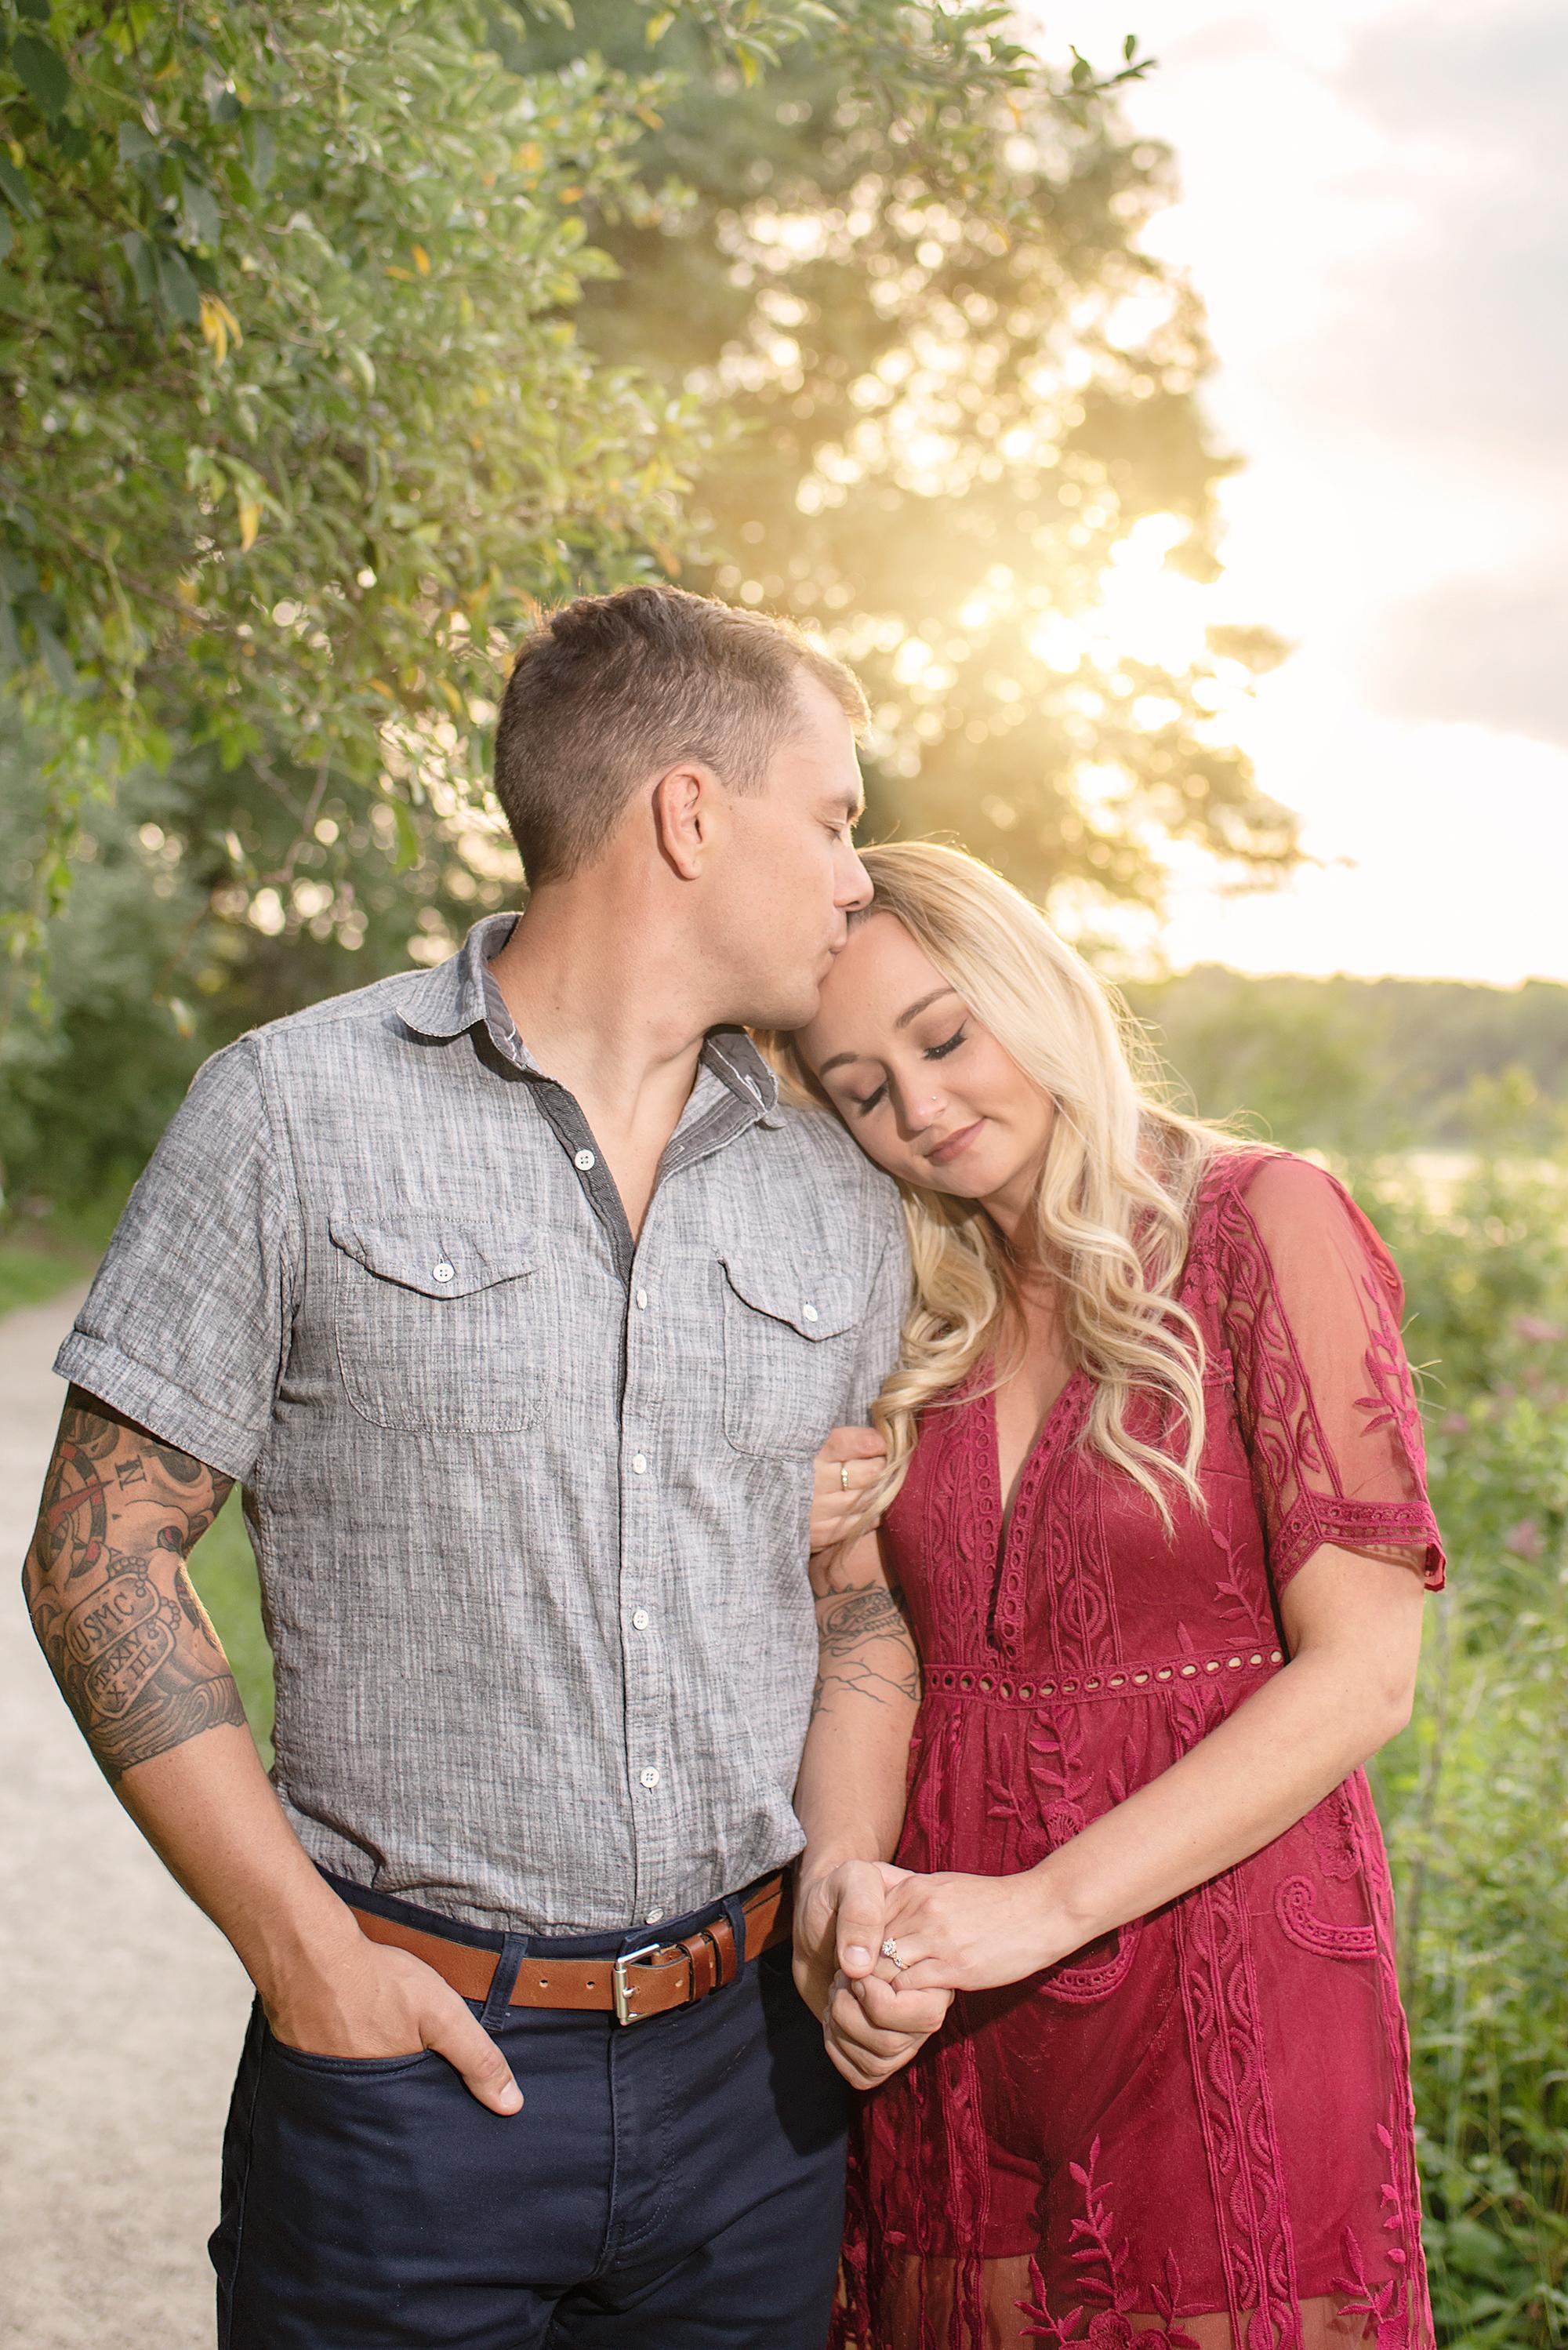 Lindsay-Adkins-Photography-Michigan-Wedding-Photographer-Page-David-Kensington-Metro-Park-Milford-Michigan-Blog-15